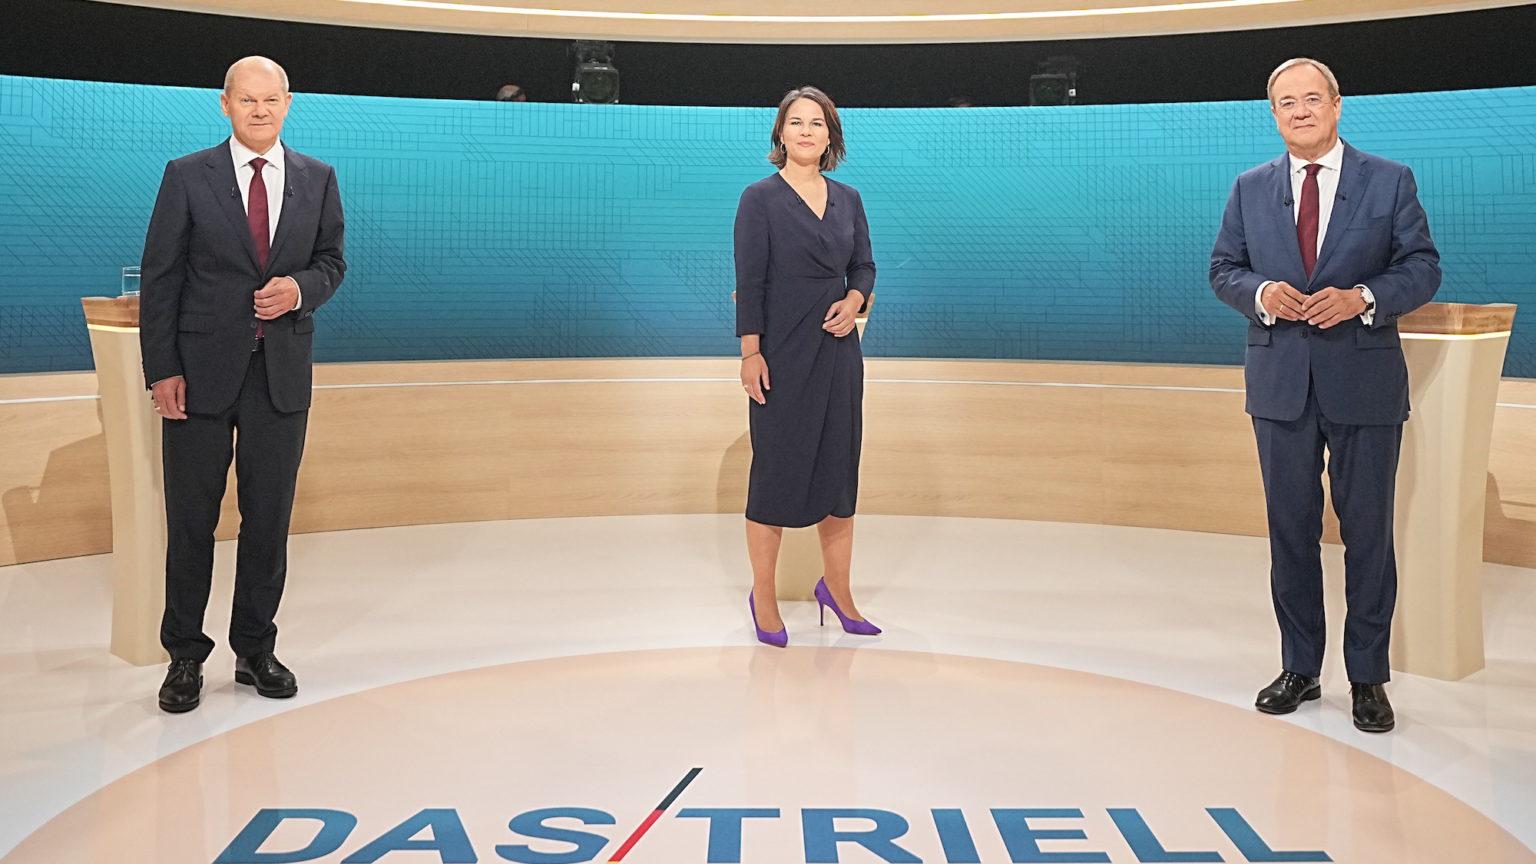 The twilight of the German establishment